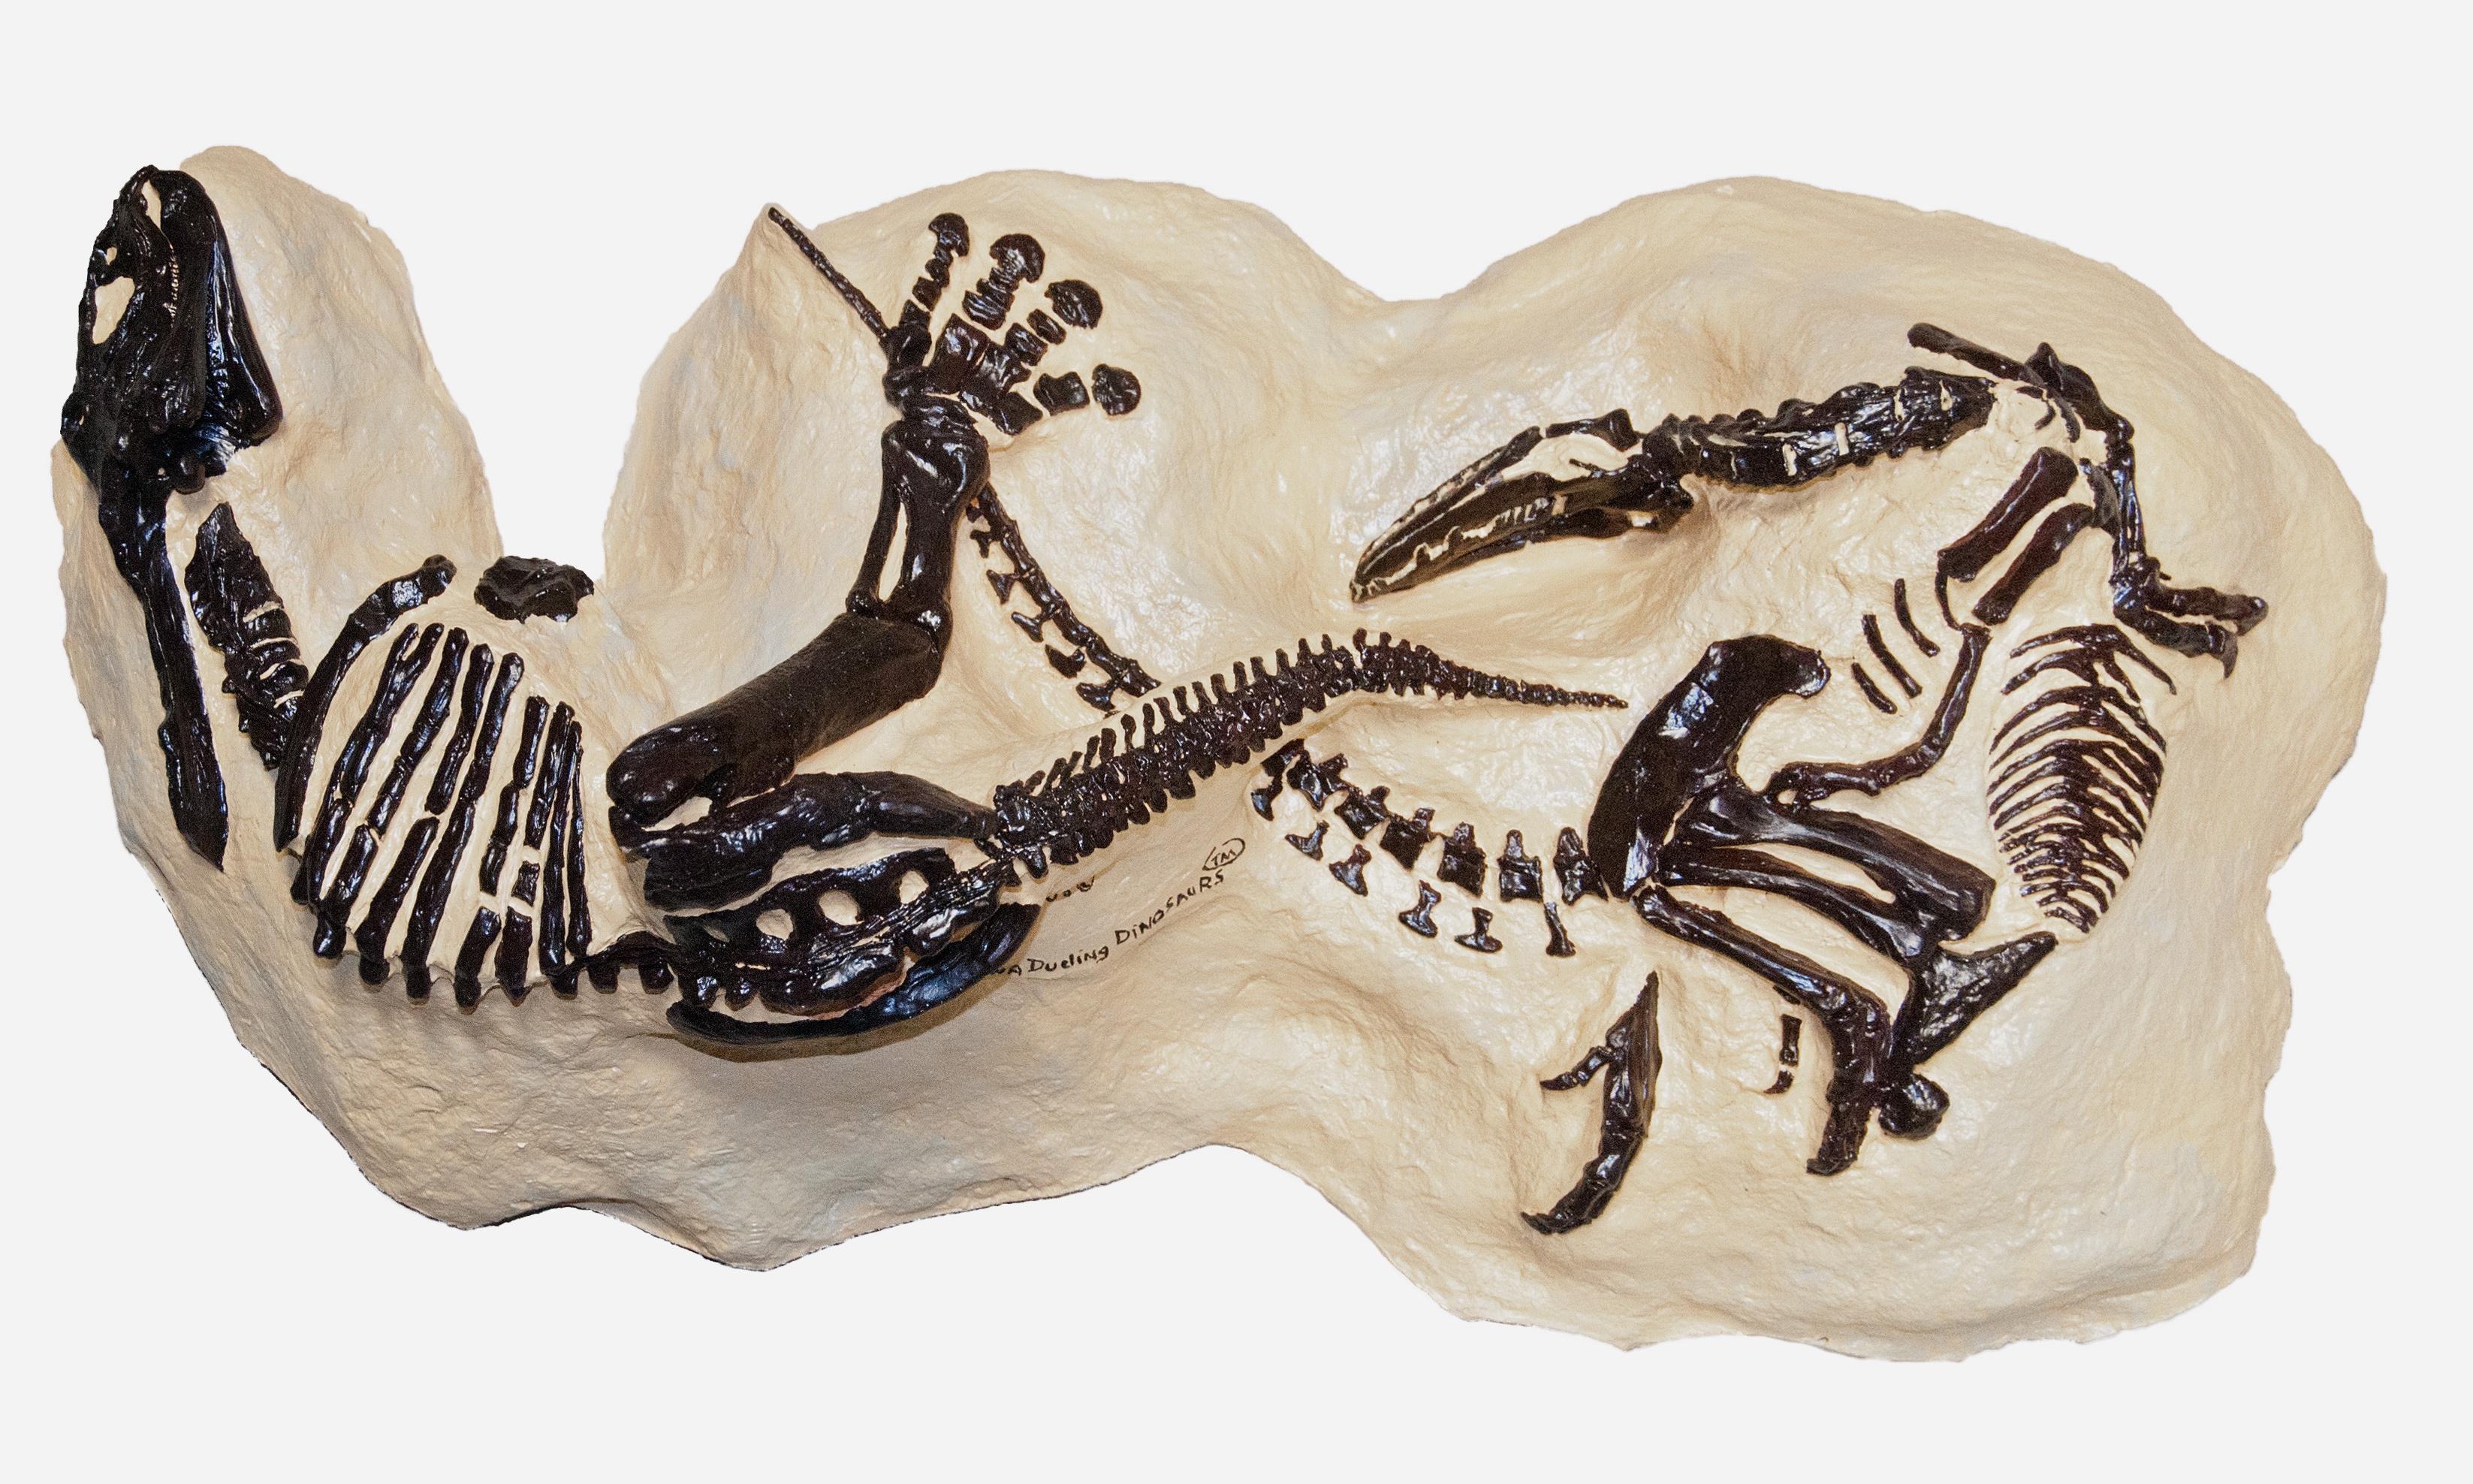 You've found an extraordinary dinosaur skeleton – what do you do now?